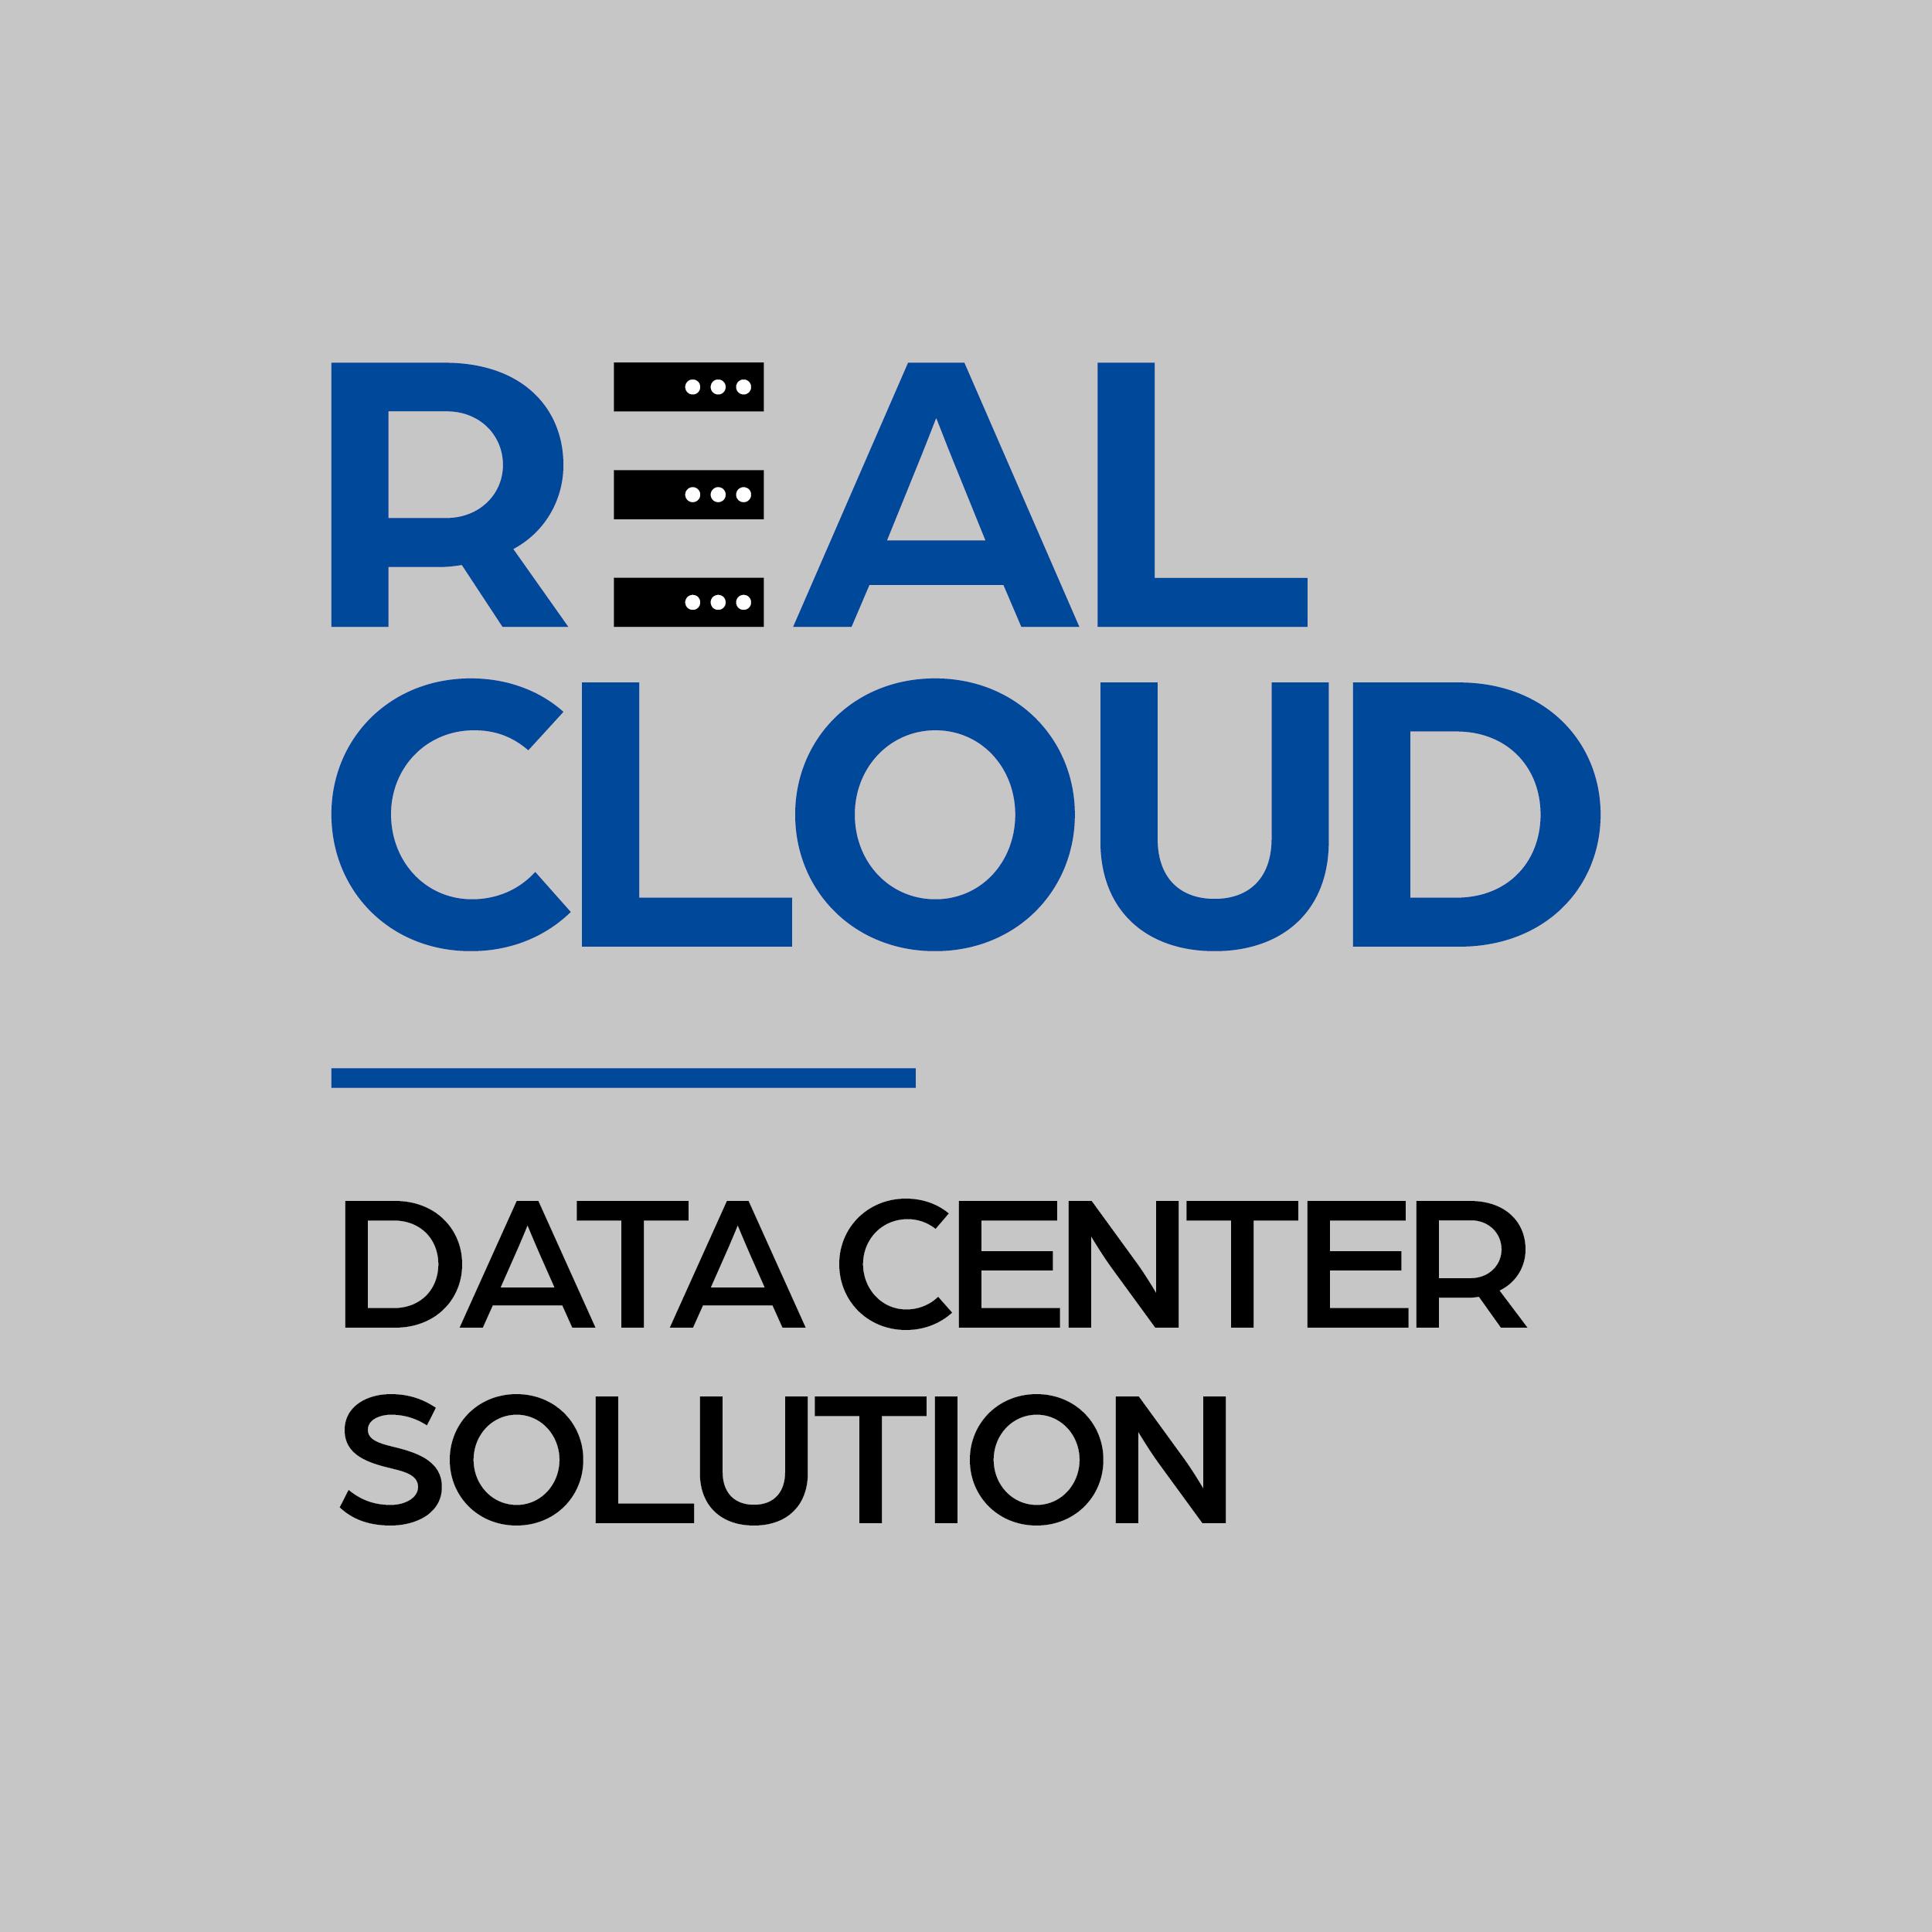 logo real cloud